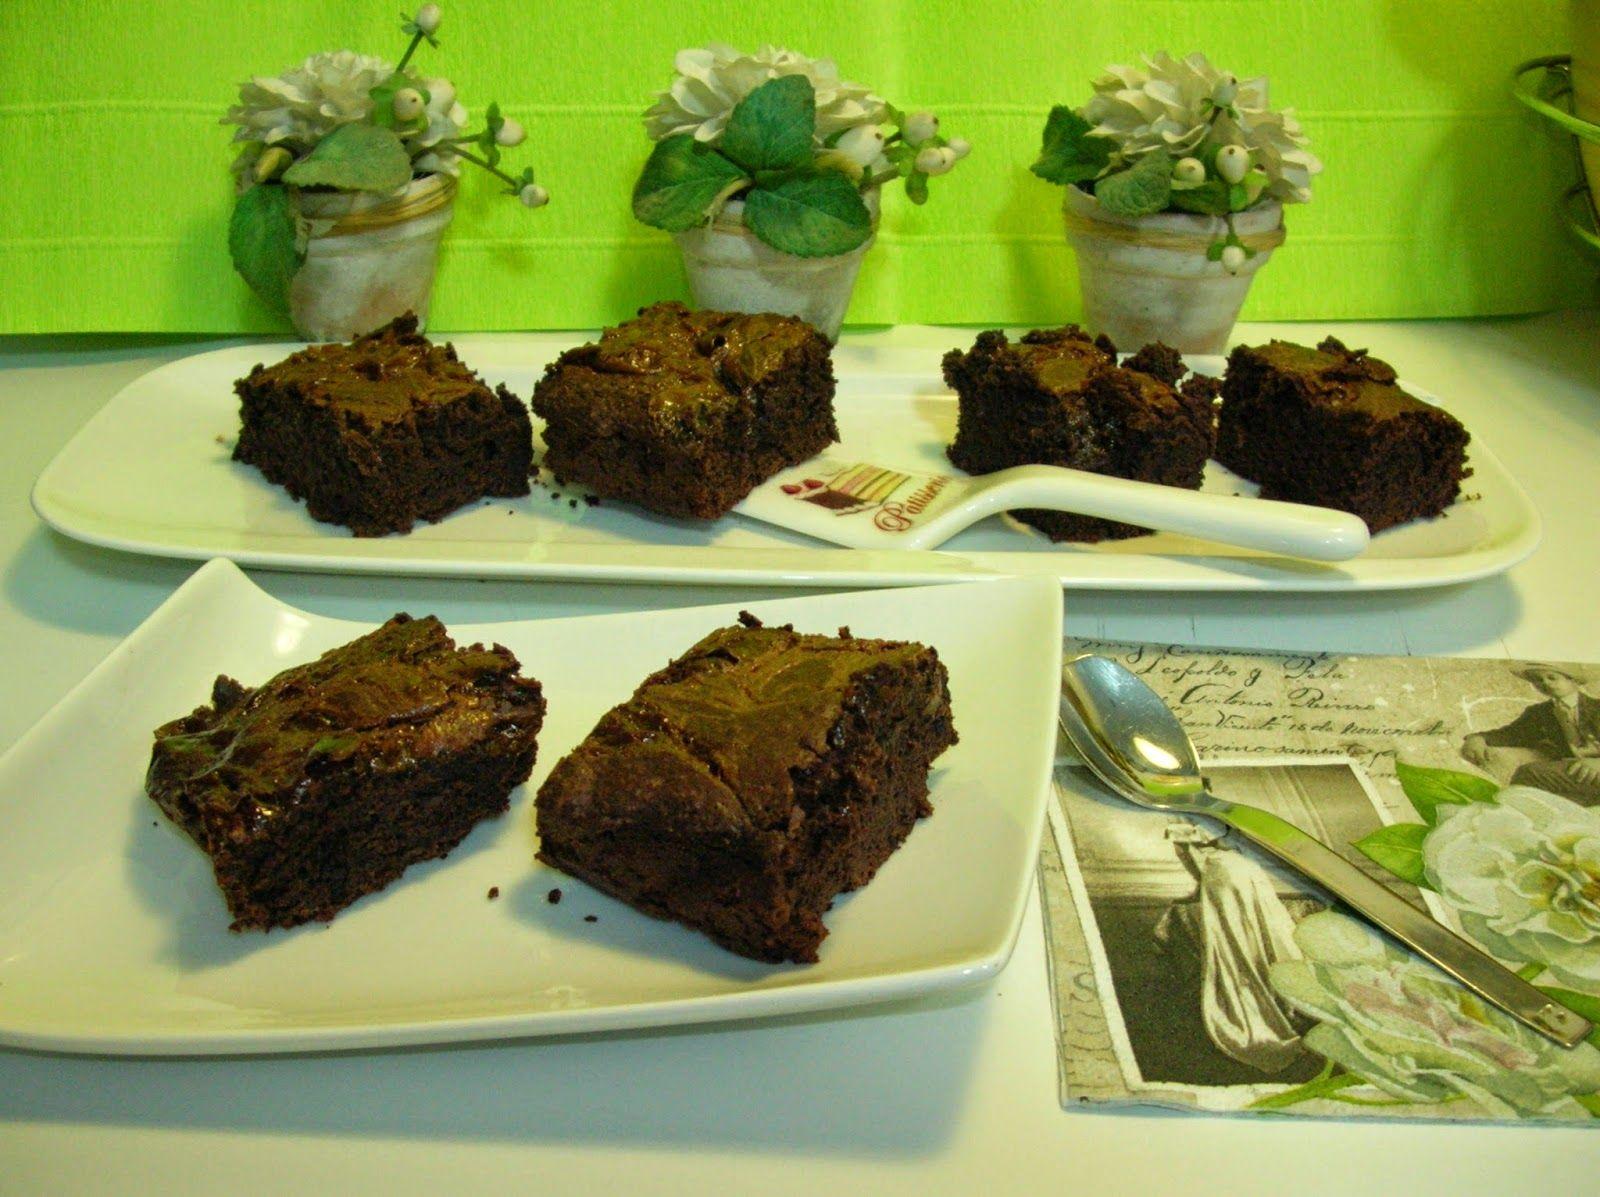 Nuvola Glacé: brownie de chocolate con dulce de leche